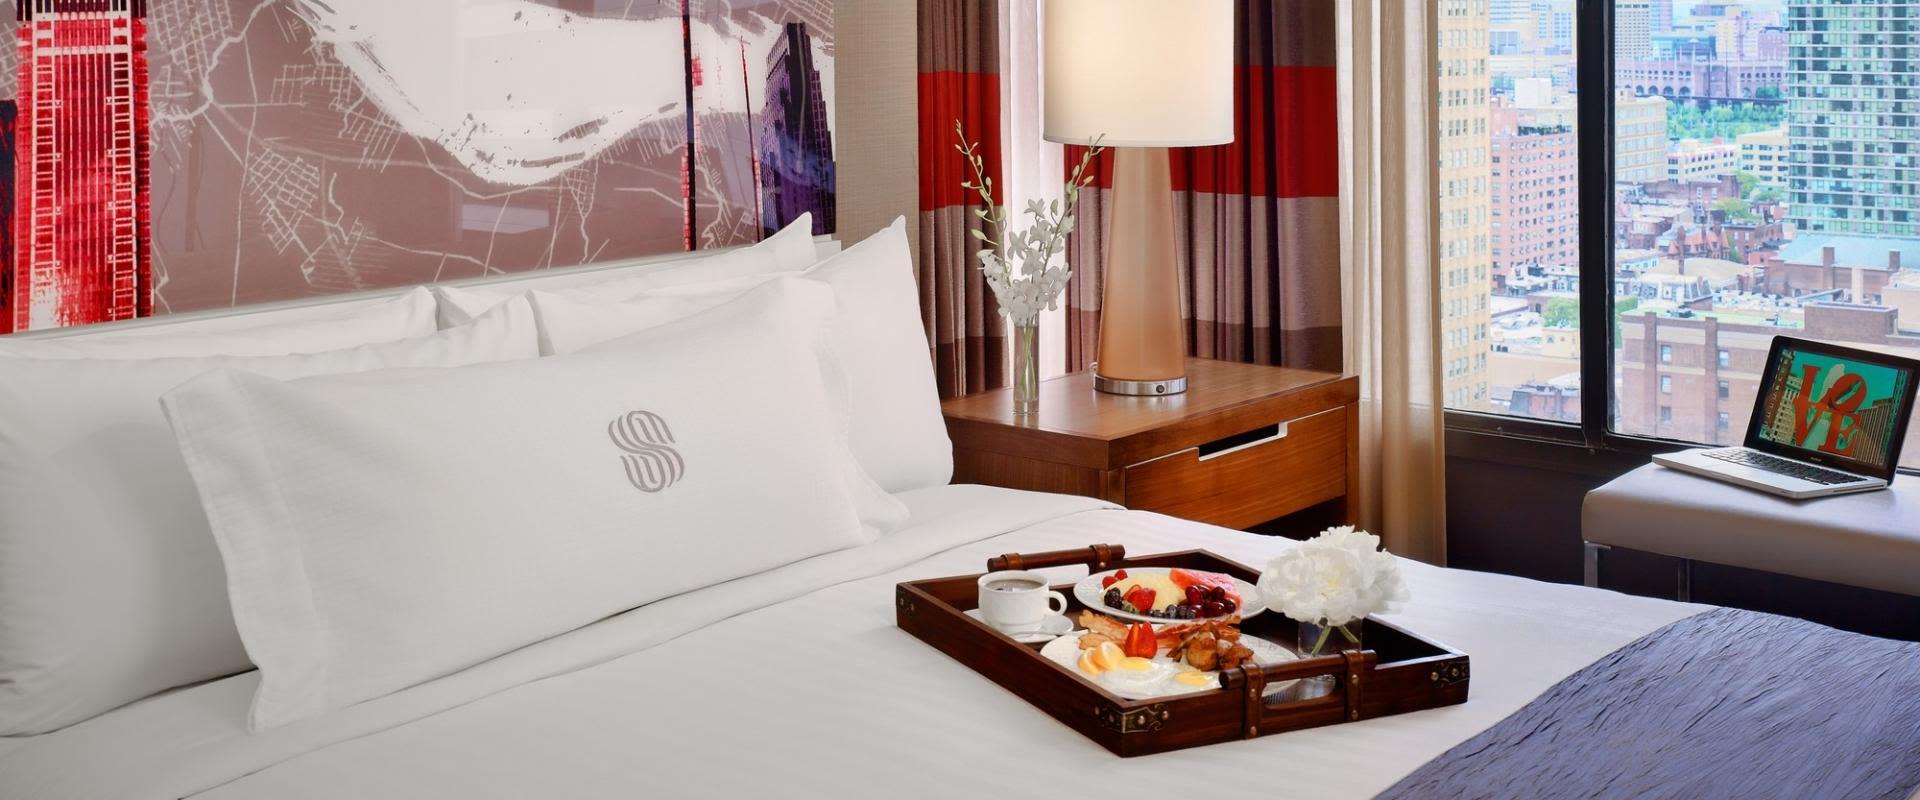 Guest Room - Breakfast In Bed